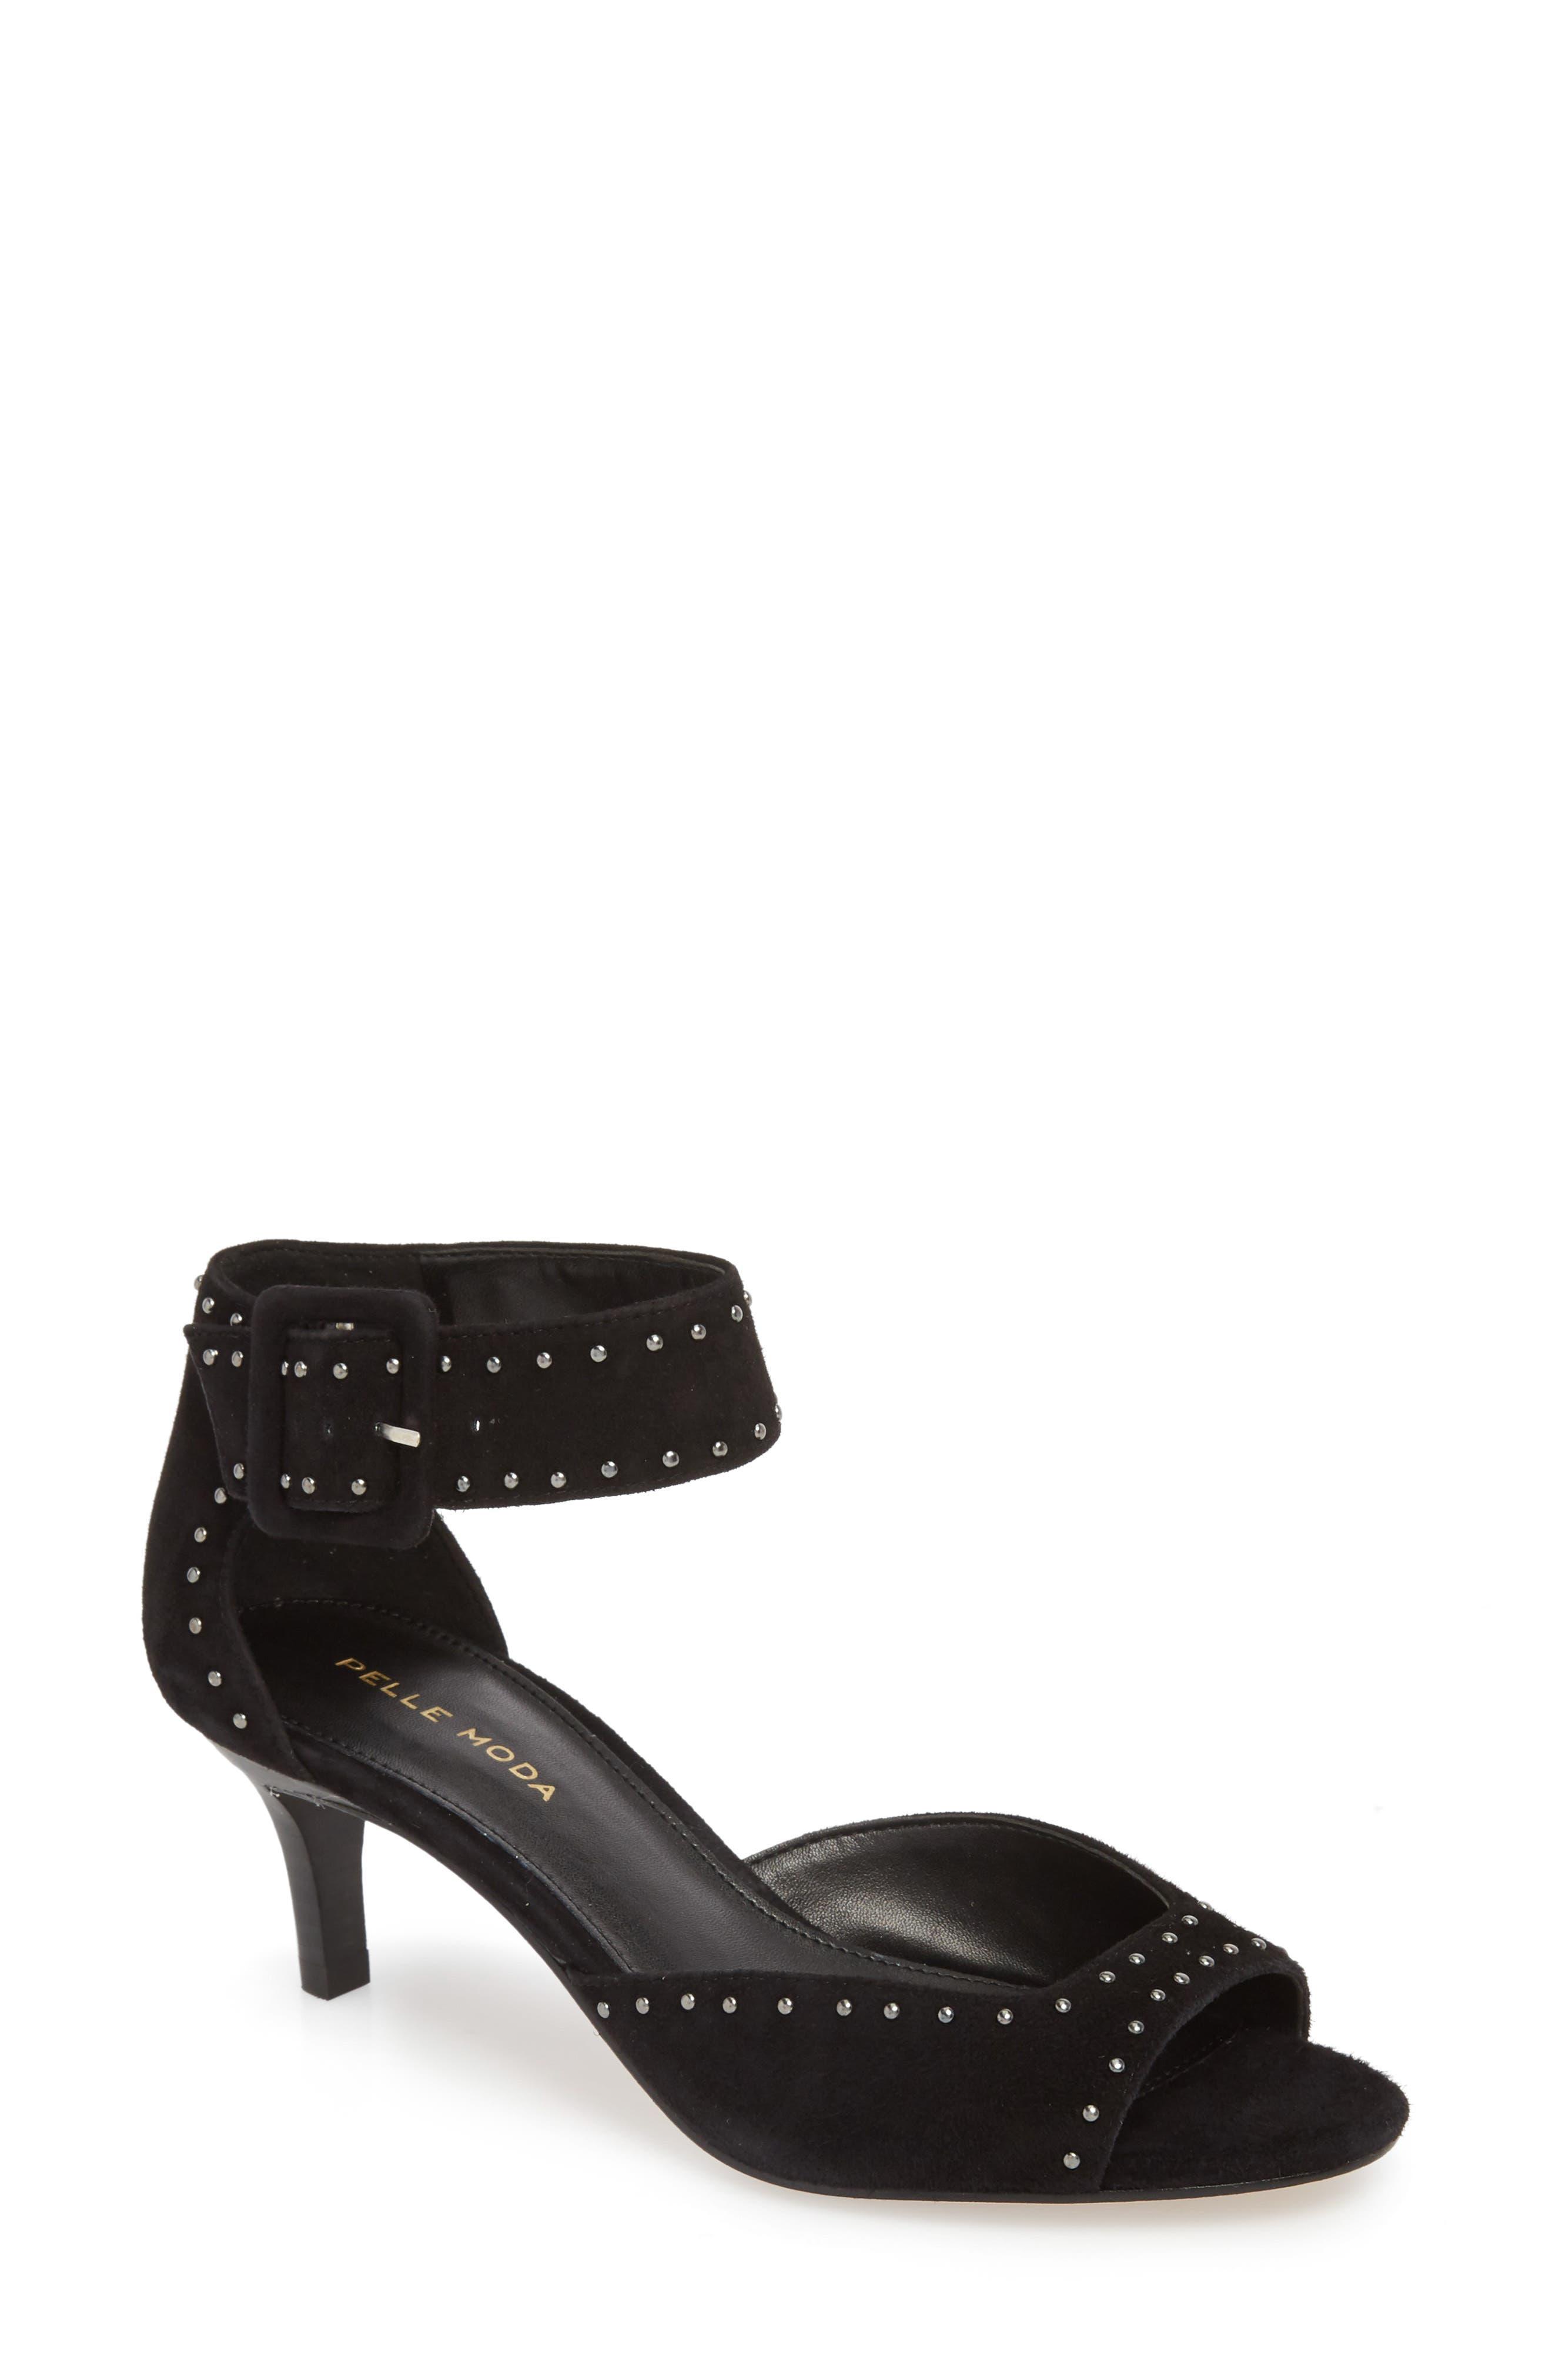 'Berlin' Sandal,                             Main thumbnail 1, color,                             BLACK/ BLACK SUEDE